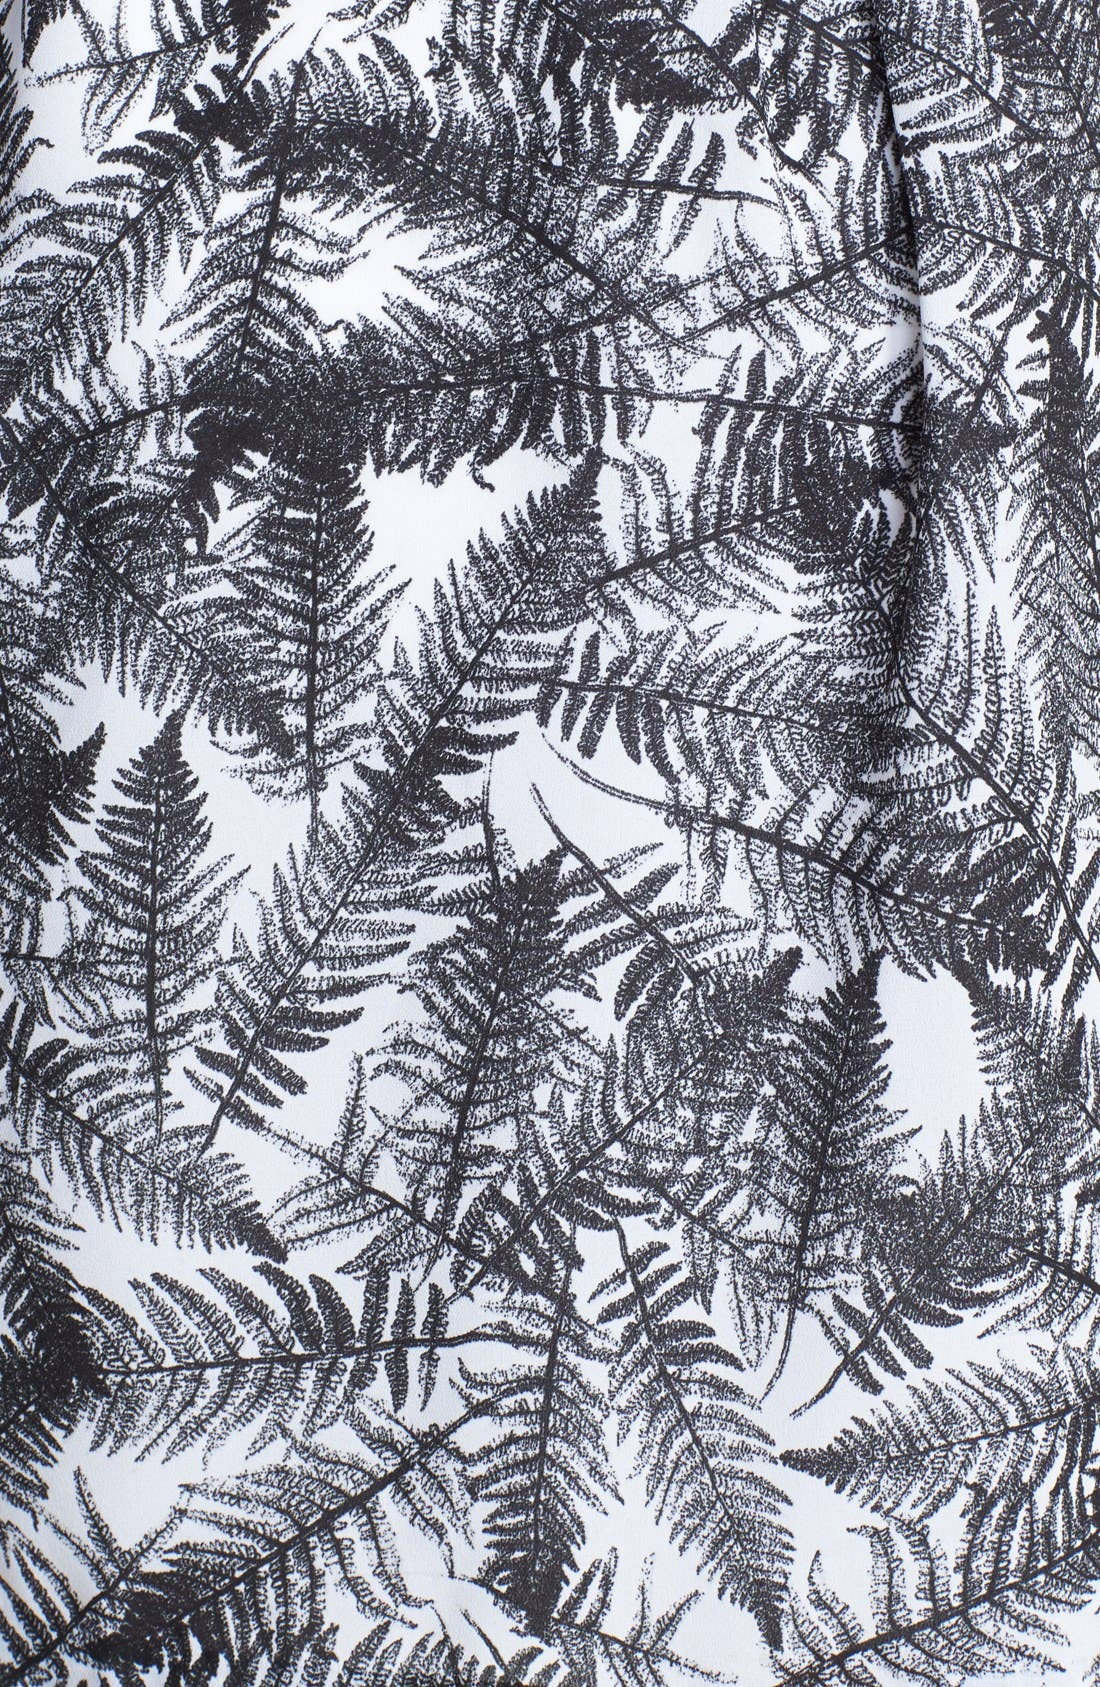 Alternate Image 3  - kensie 'Overlapped Ferns' Print Fit & Flare Dress